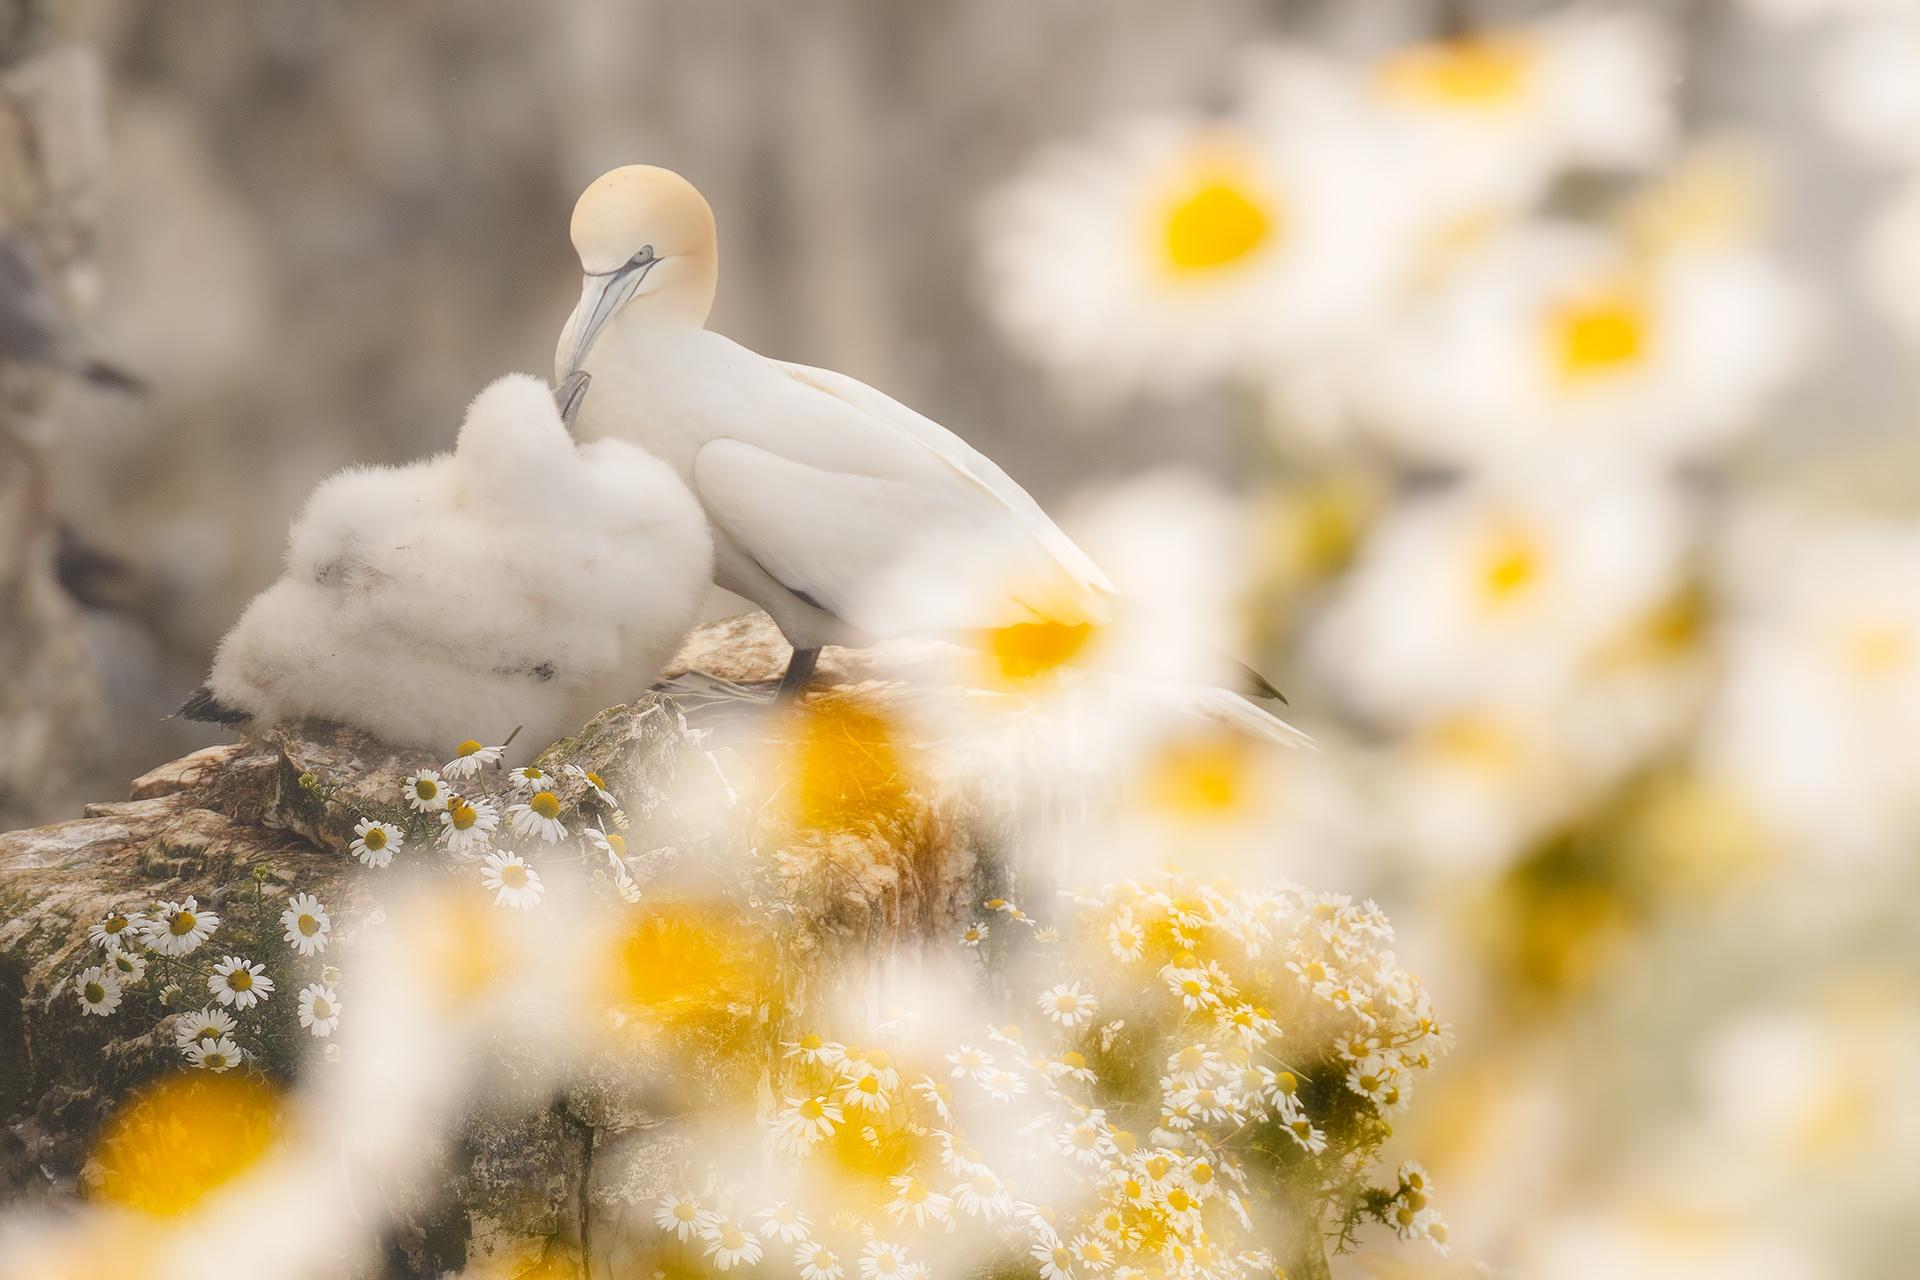 Mother´s love - Mario Suarez - Portfolio Natural, Fotografía de Naturaleza de Autor